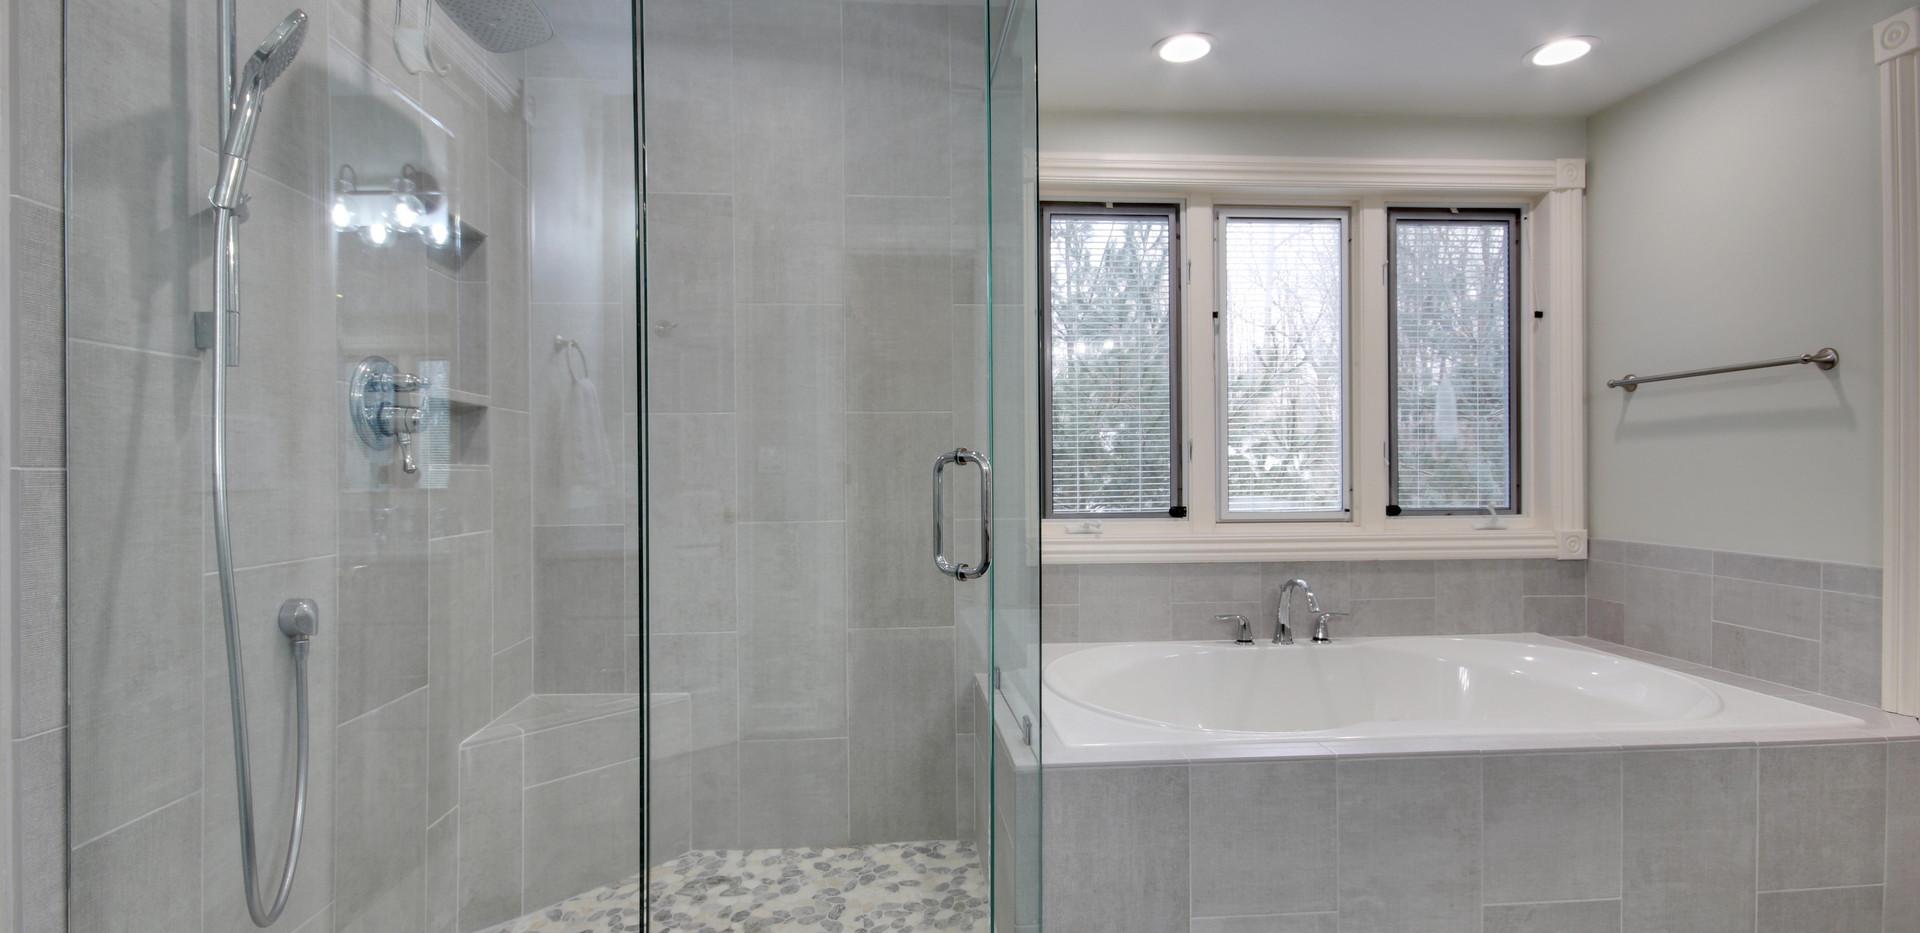 Full Grand Haven bathroom remodel